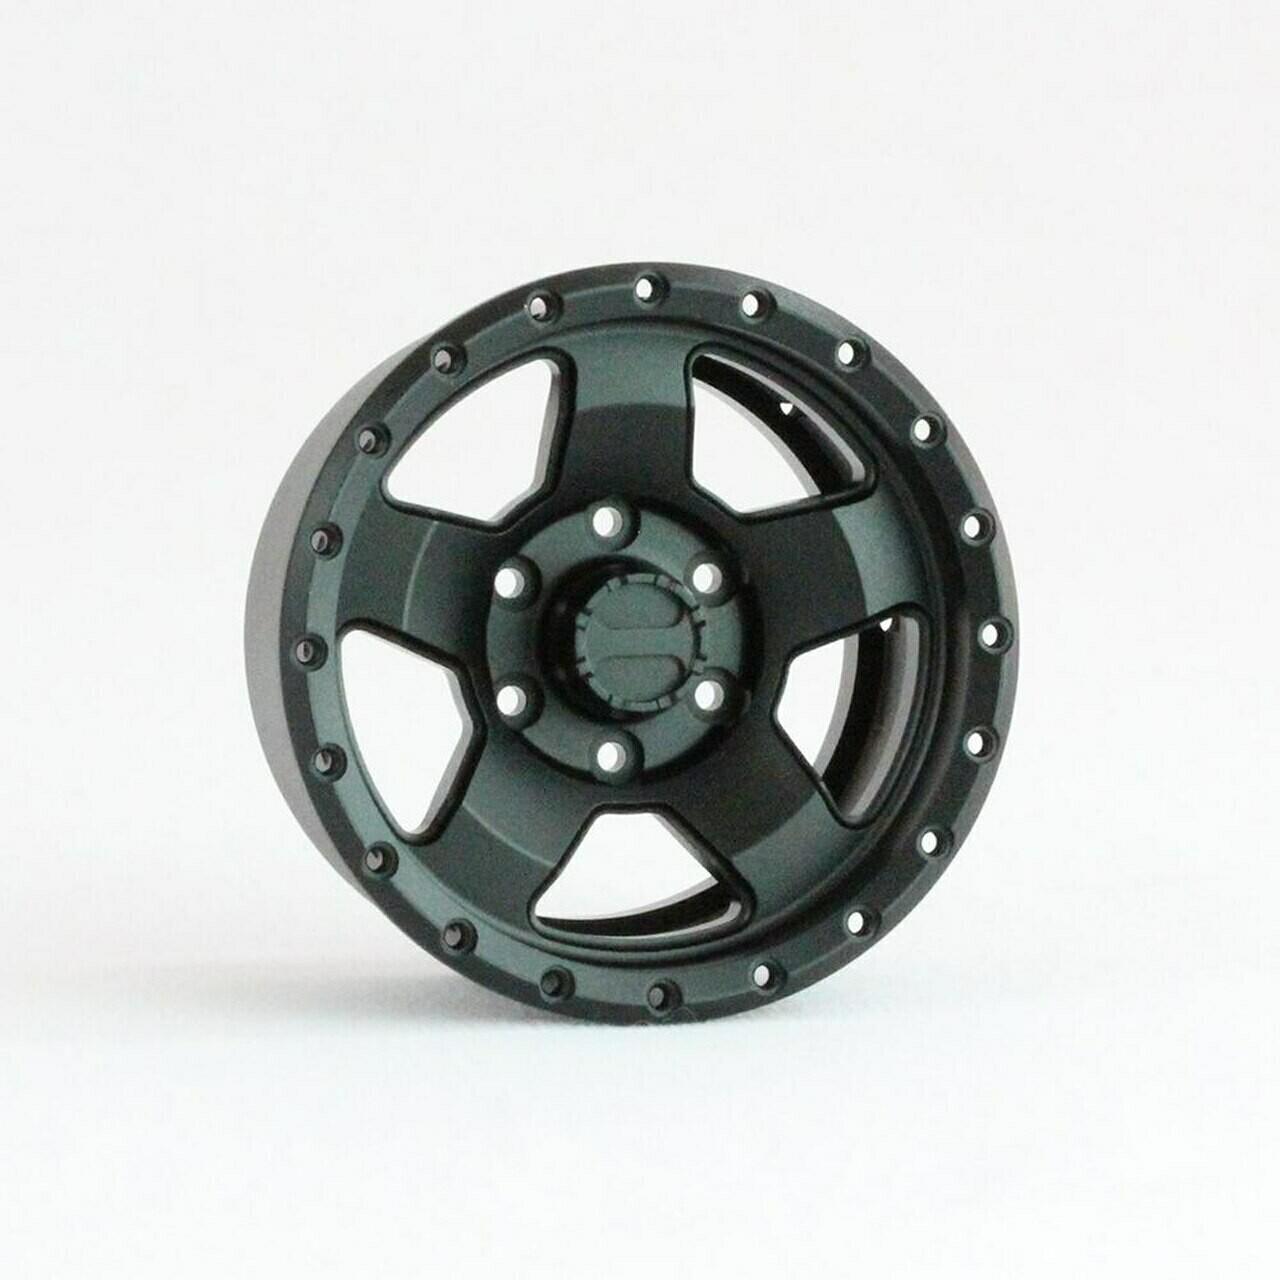 "Pitbull 1.9"" Raceline Combat Aluminum Wheels, Black, (4) PBTPBW19CMBB"